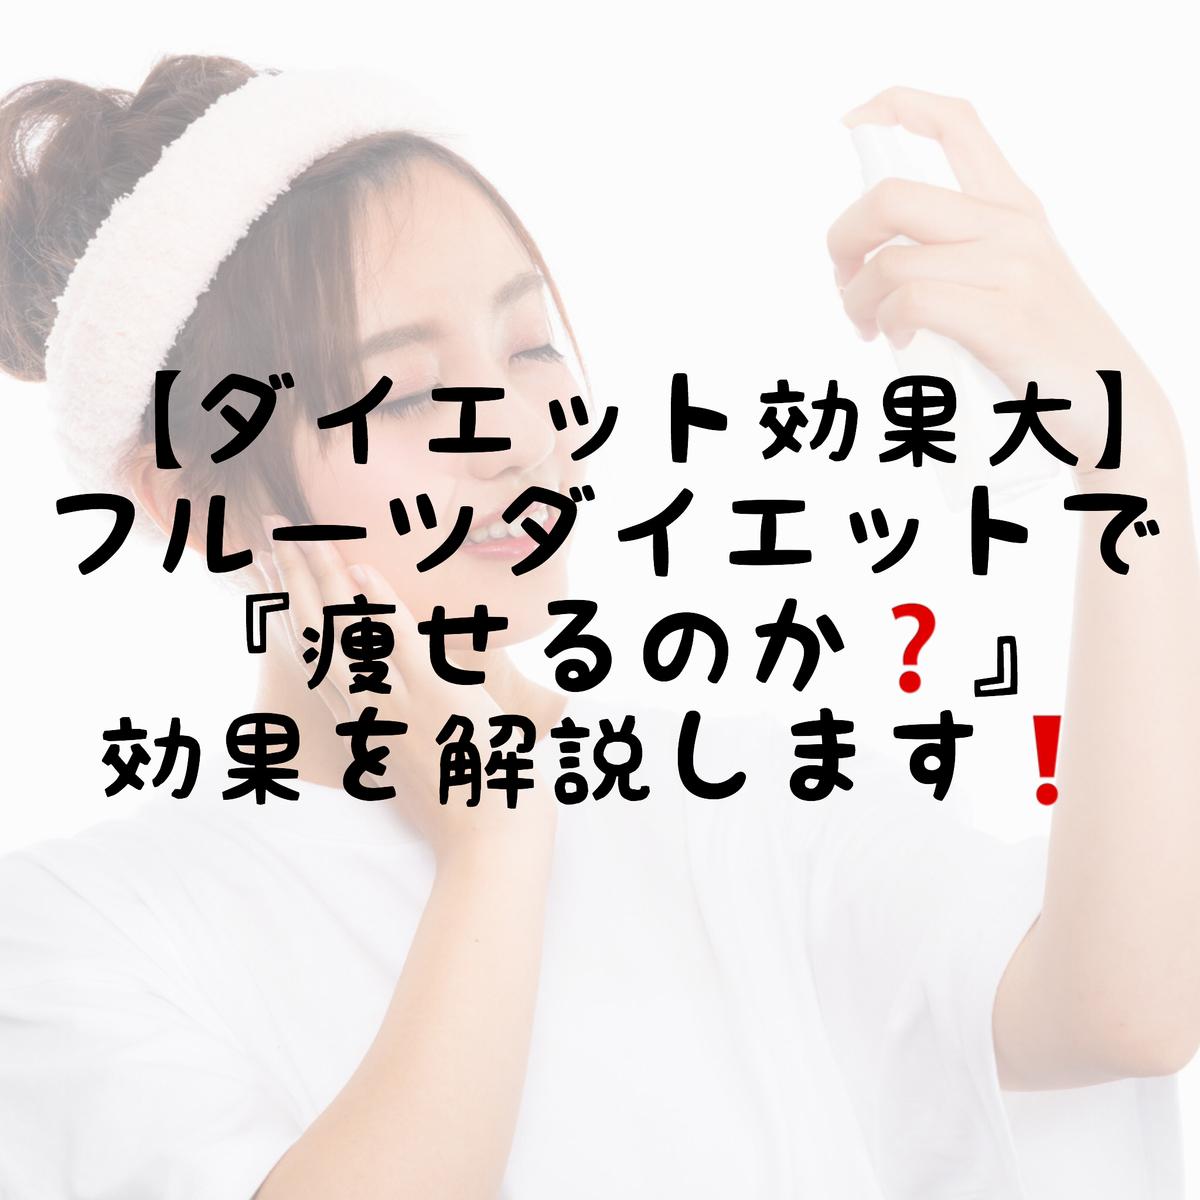 f:id:nokonoko_o:20200601181202j:plain